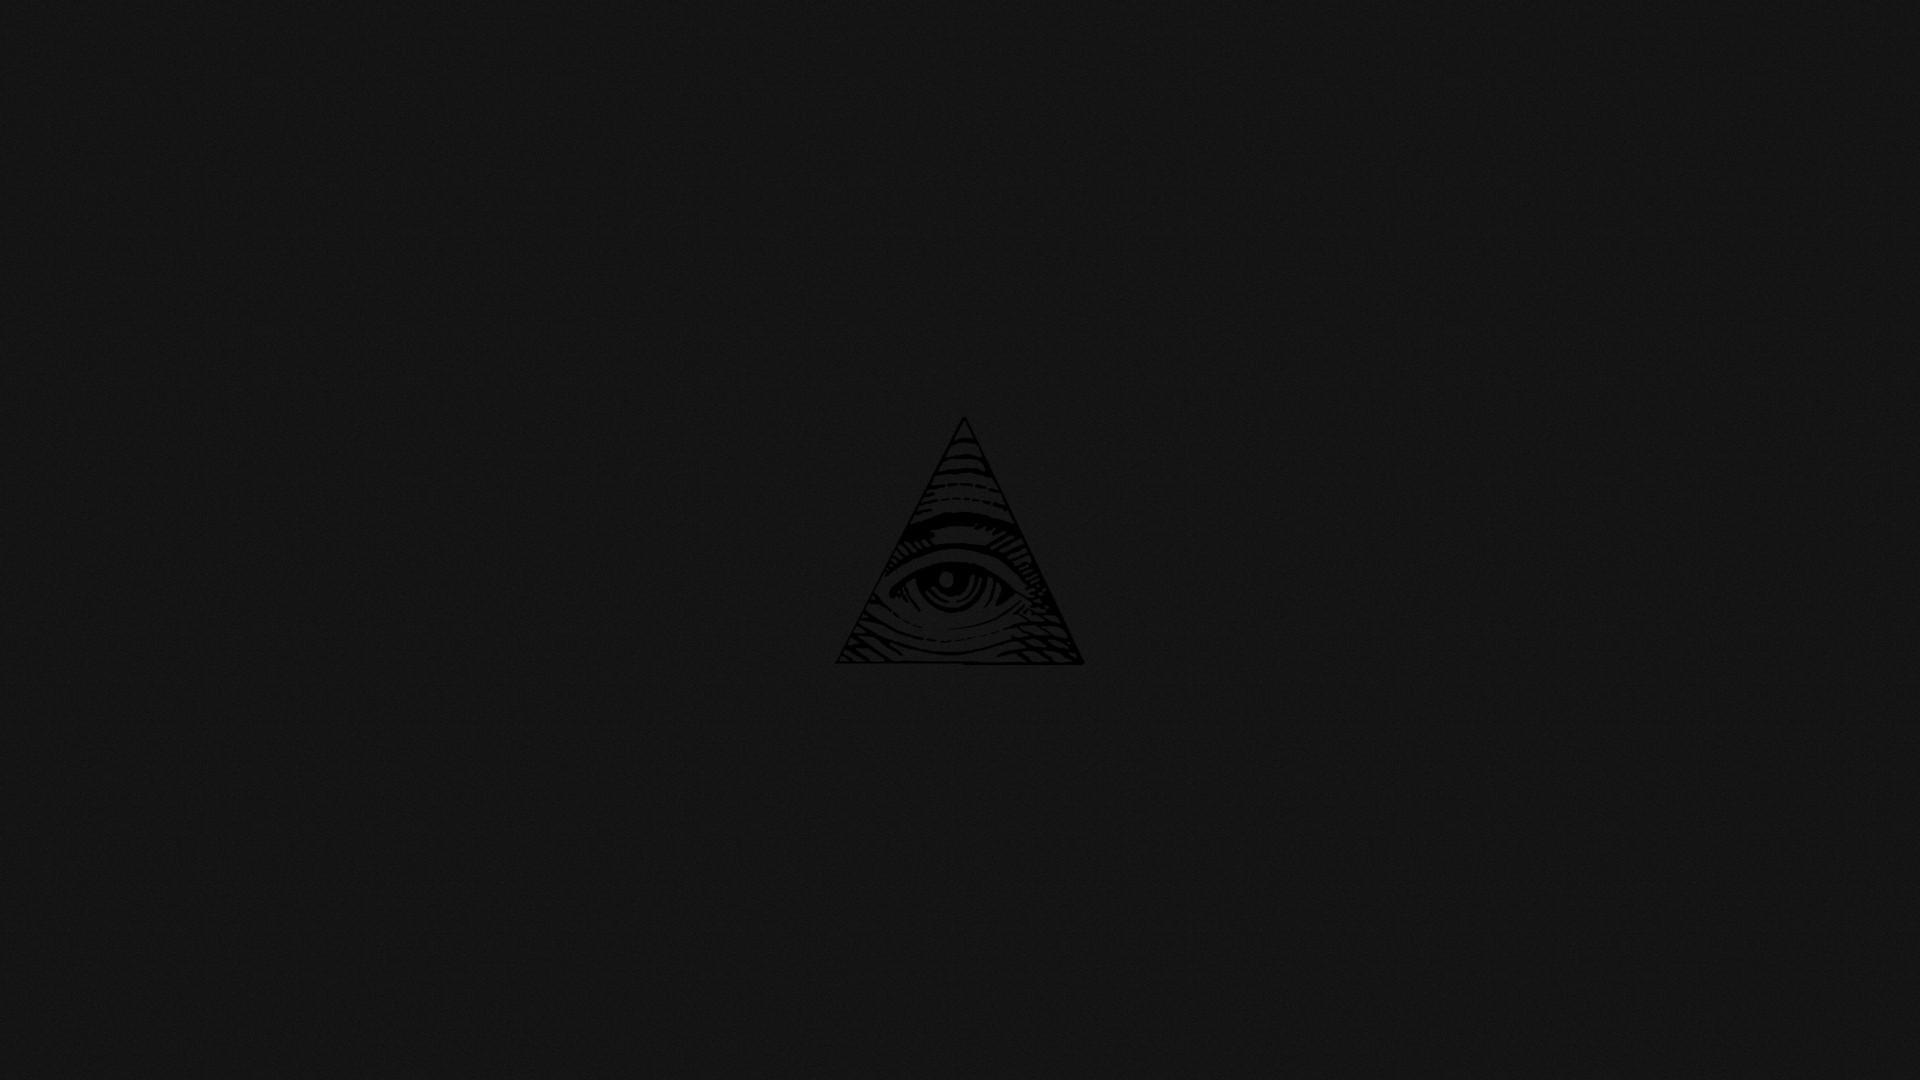 Gravity Falls Wallpapers Hd 1080p Illuminati Backgrounds Pixelstalk Net